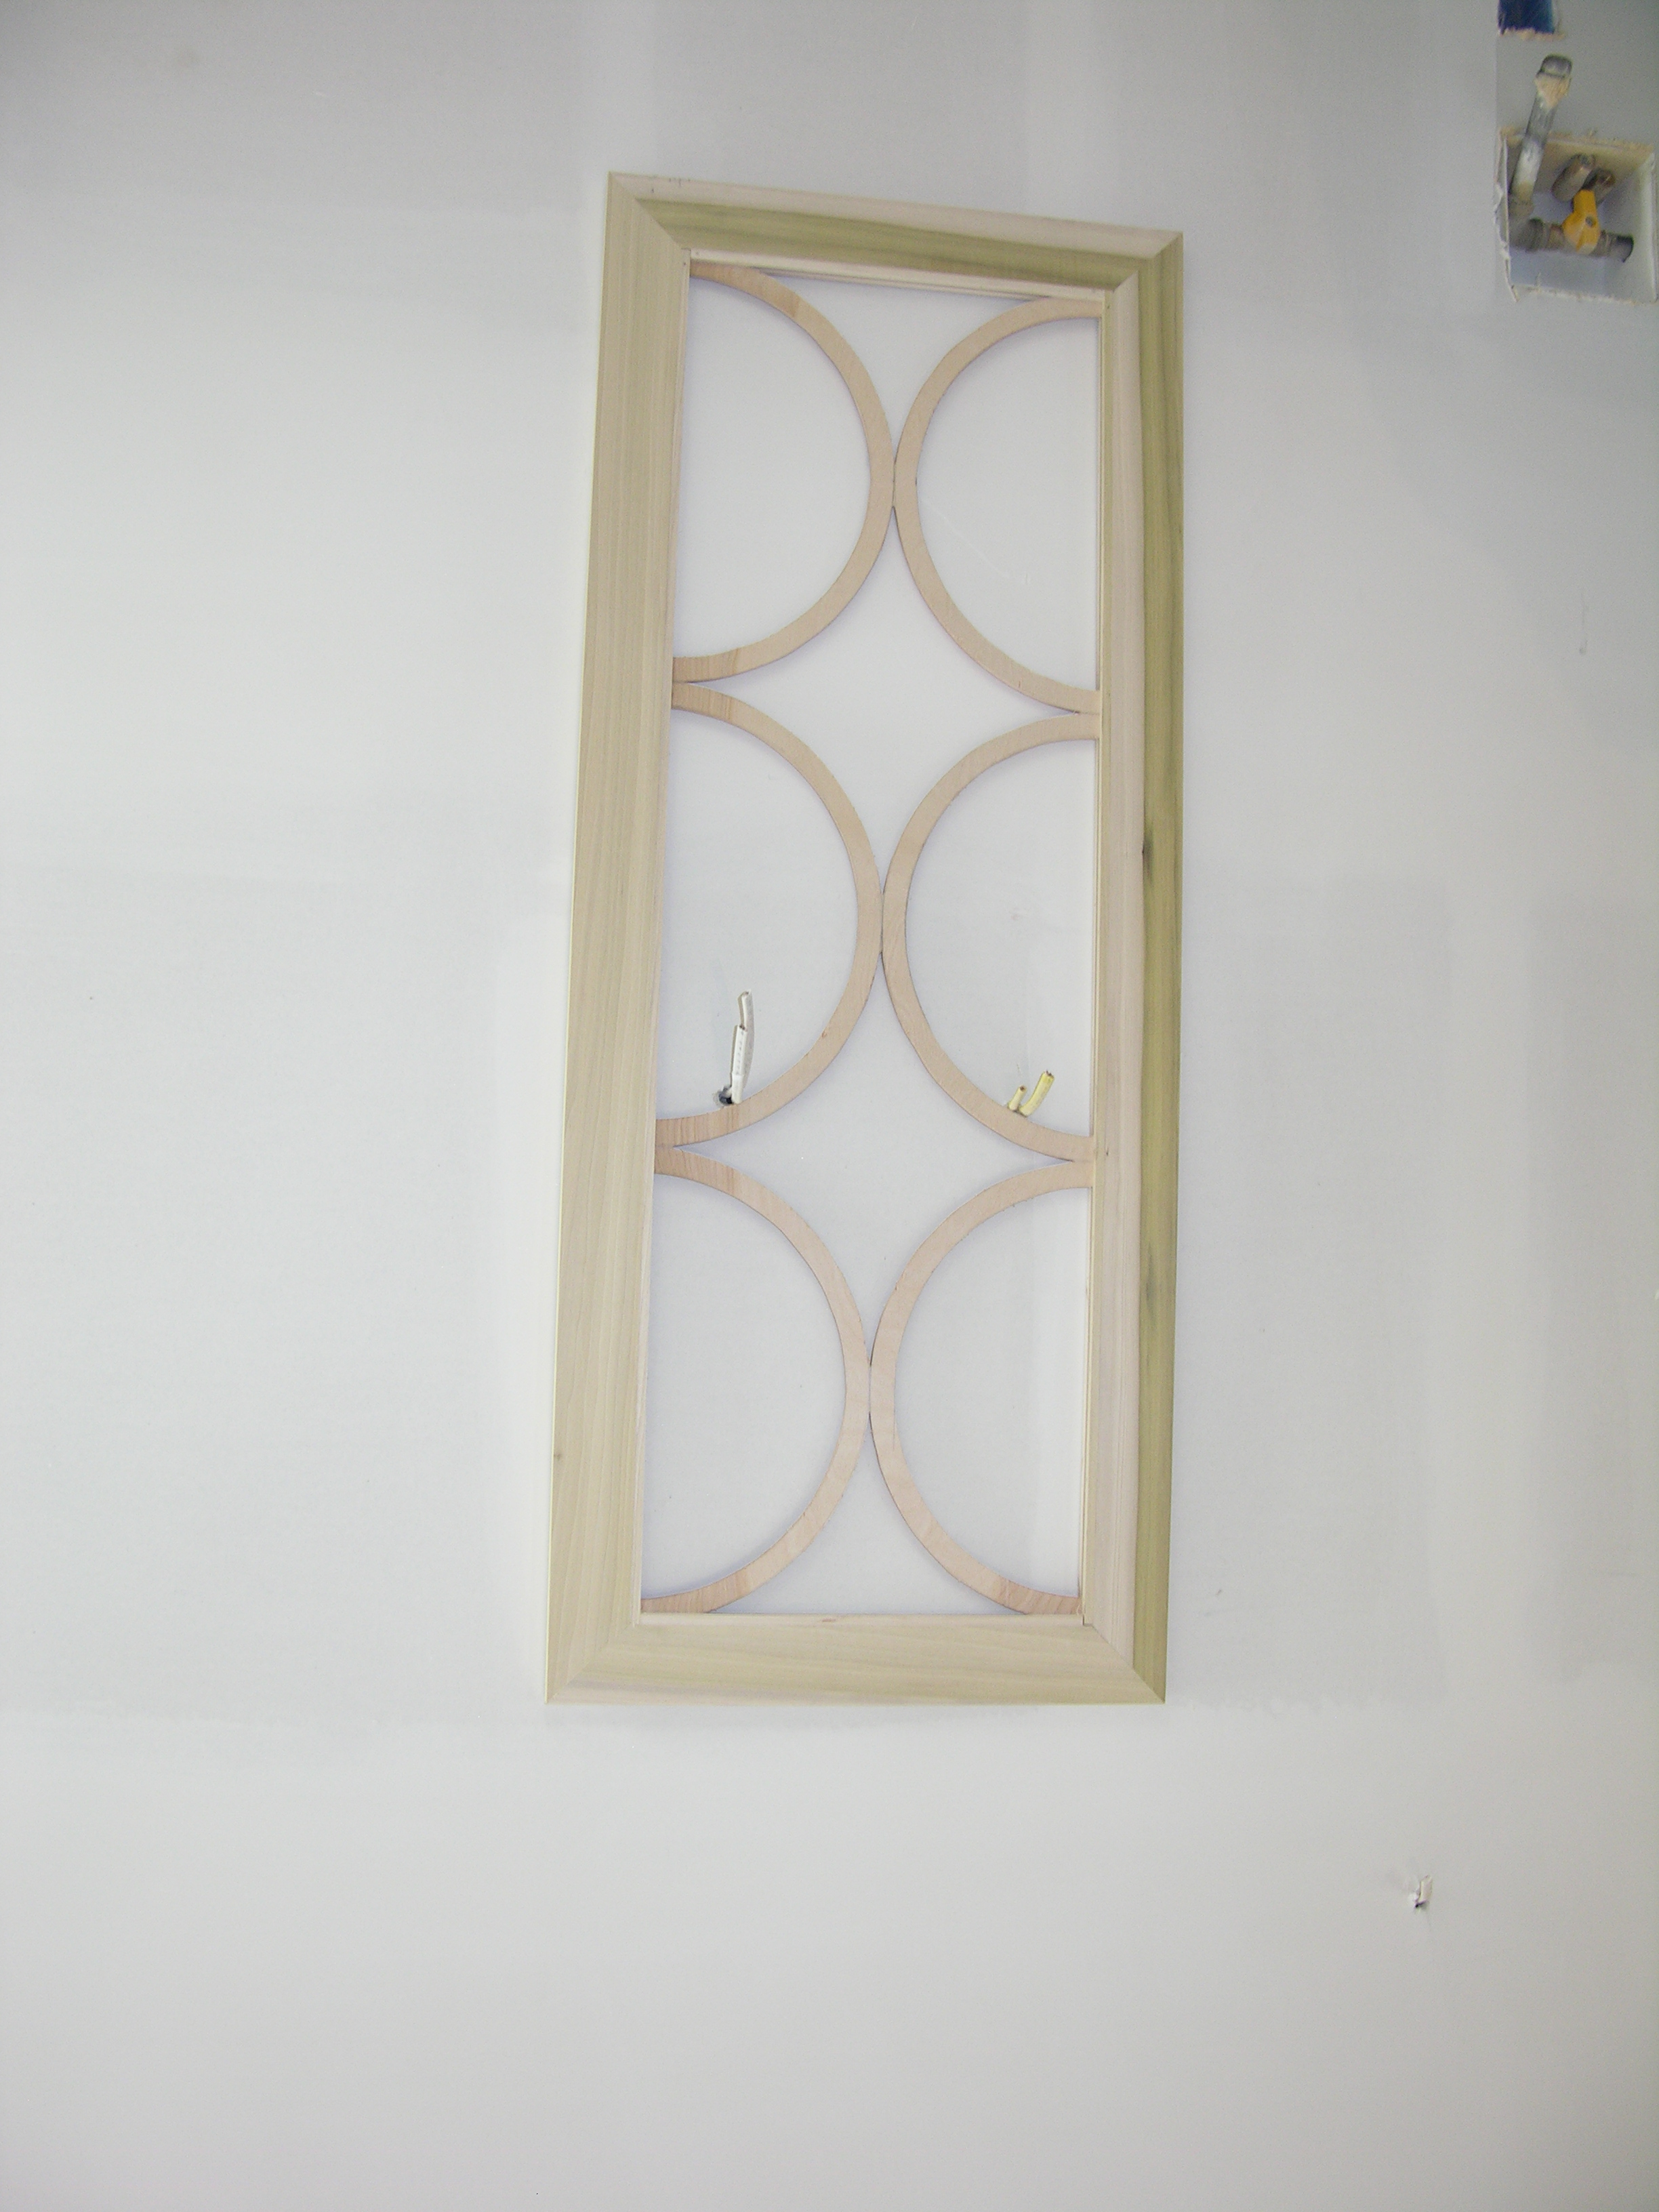 Woodworking Plans Linen Cabinet PDF Download diy wood decor